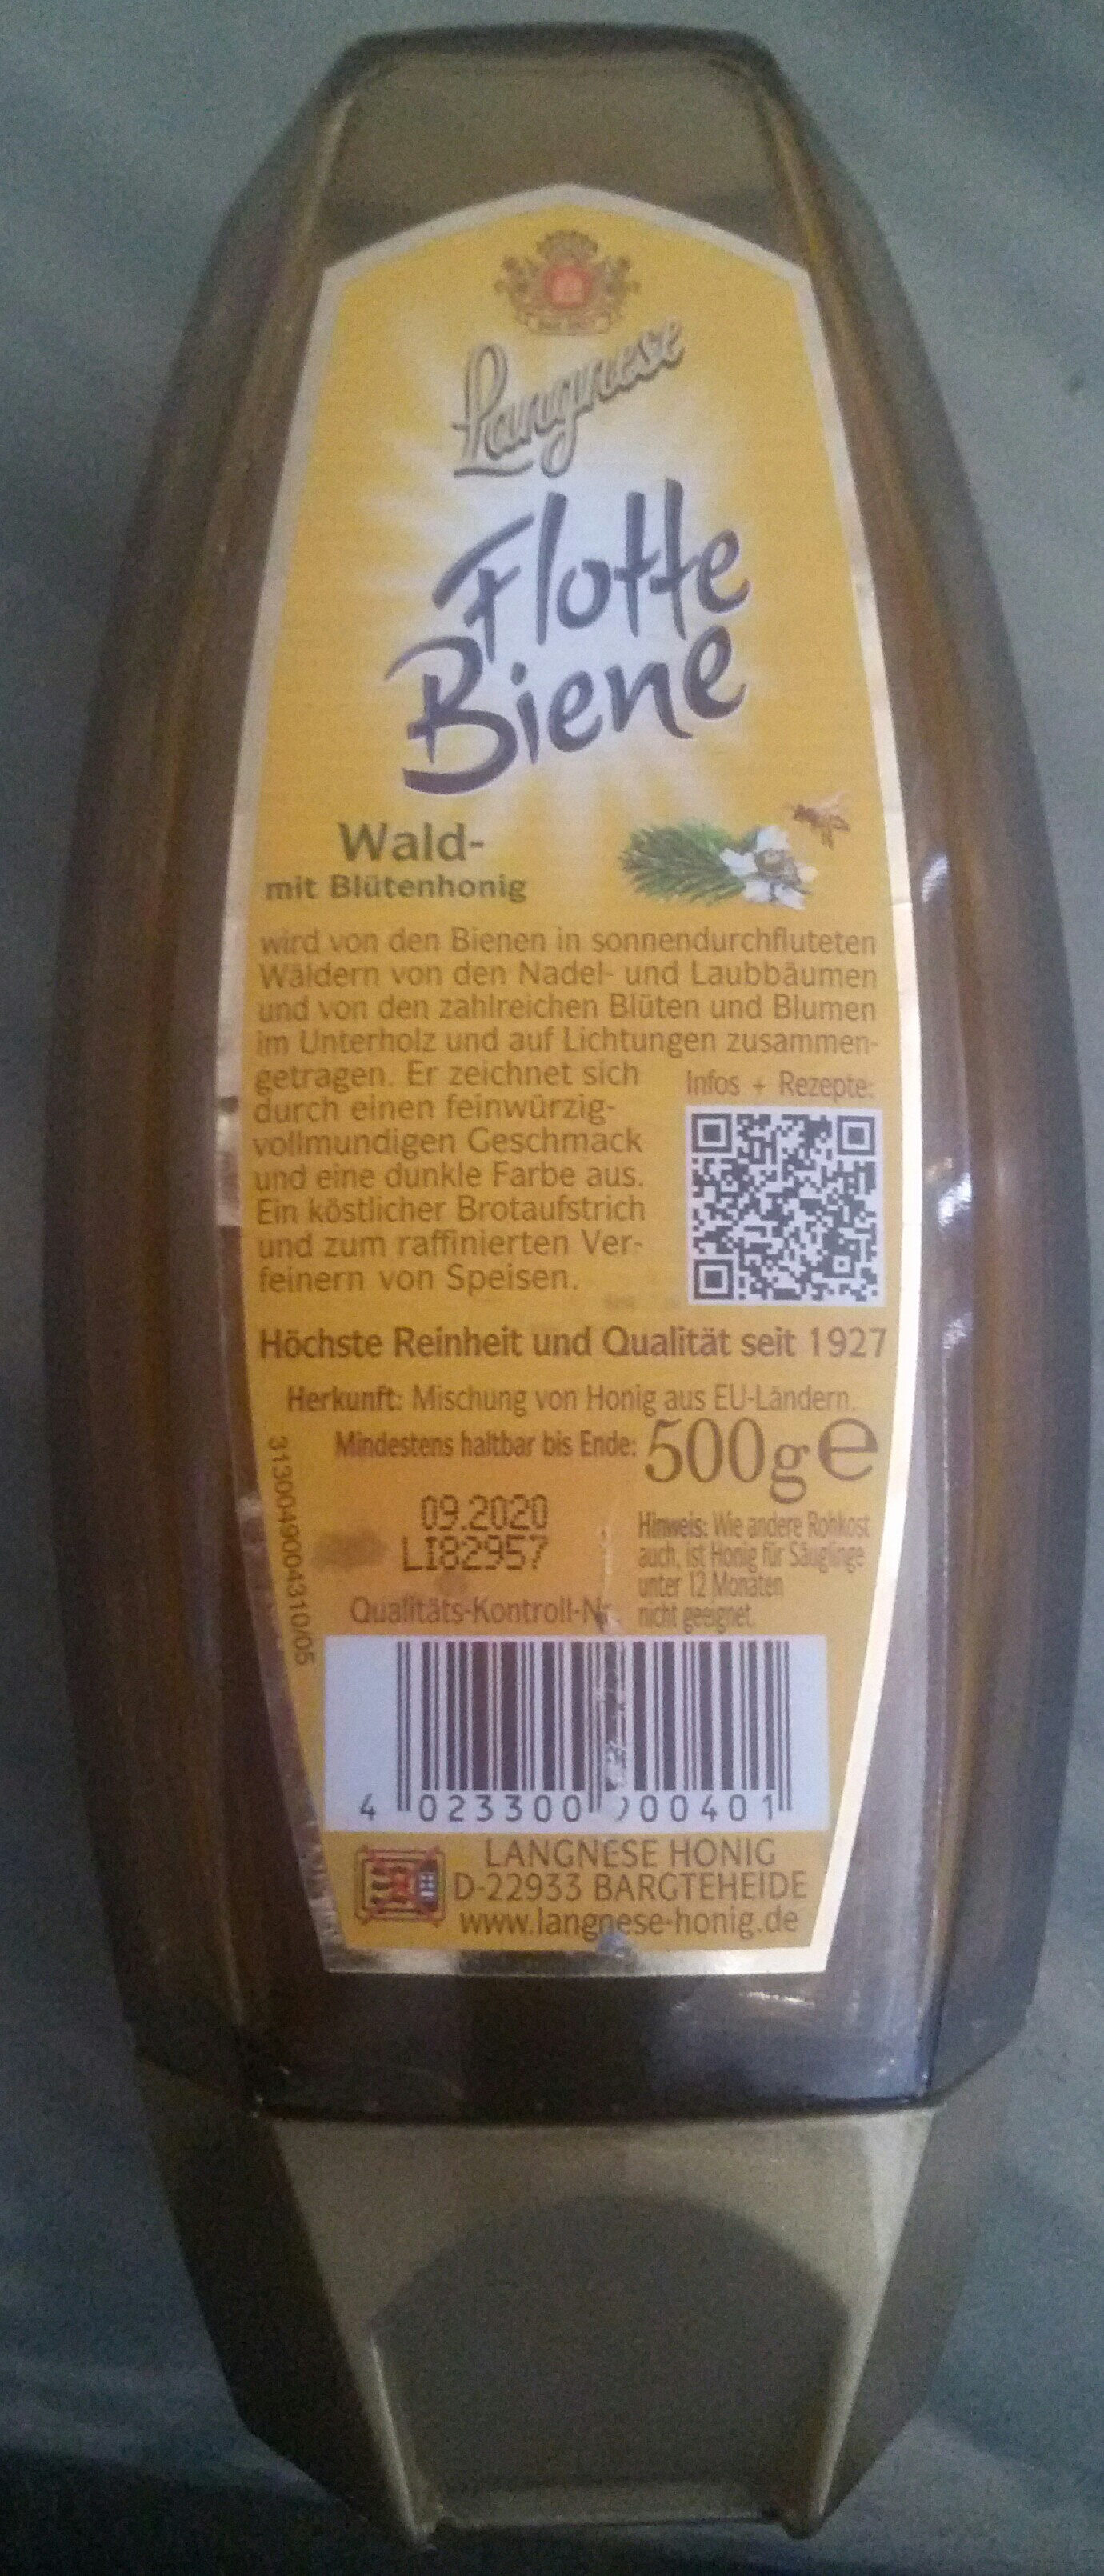 Flotte Biene Wald- mit Blütenhonig - Nutrition facts - de